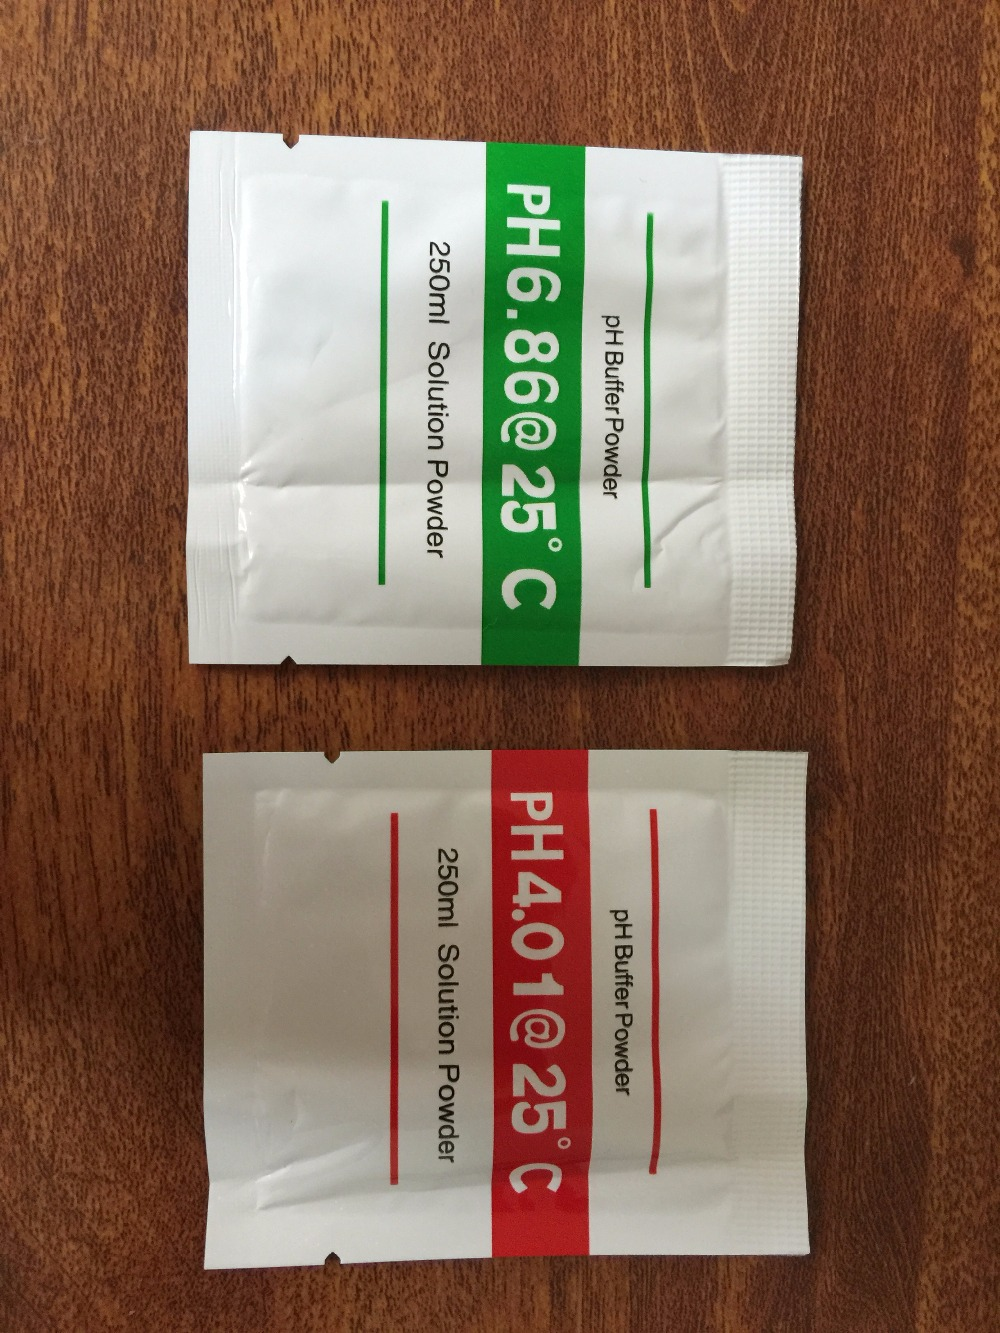 20pcs PH Buffer Powder for PH Test Meter Measure Calibration Solution 4.01 6.86pH<br><br>Aliexpress